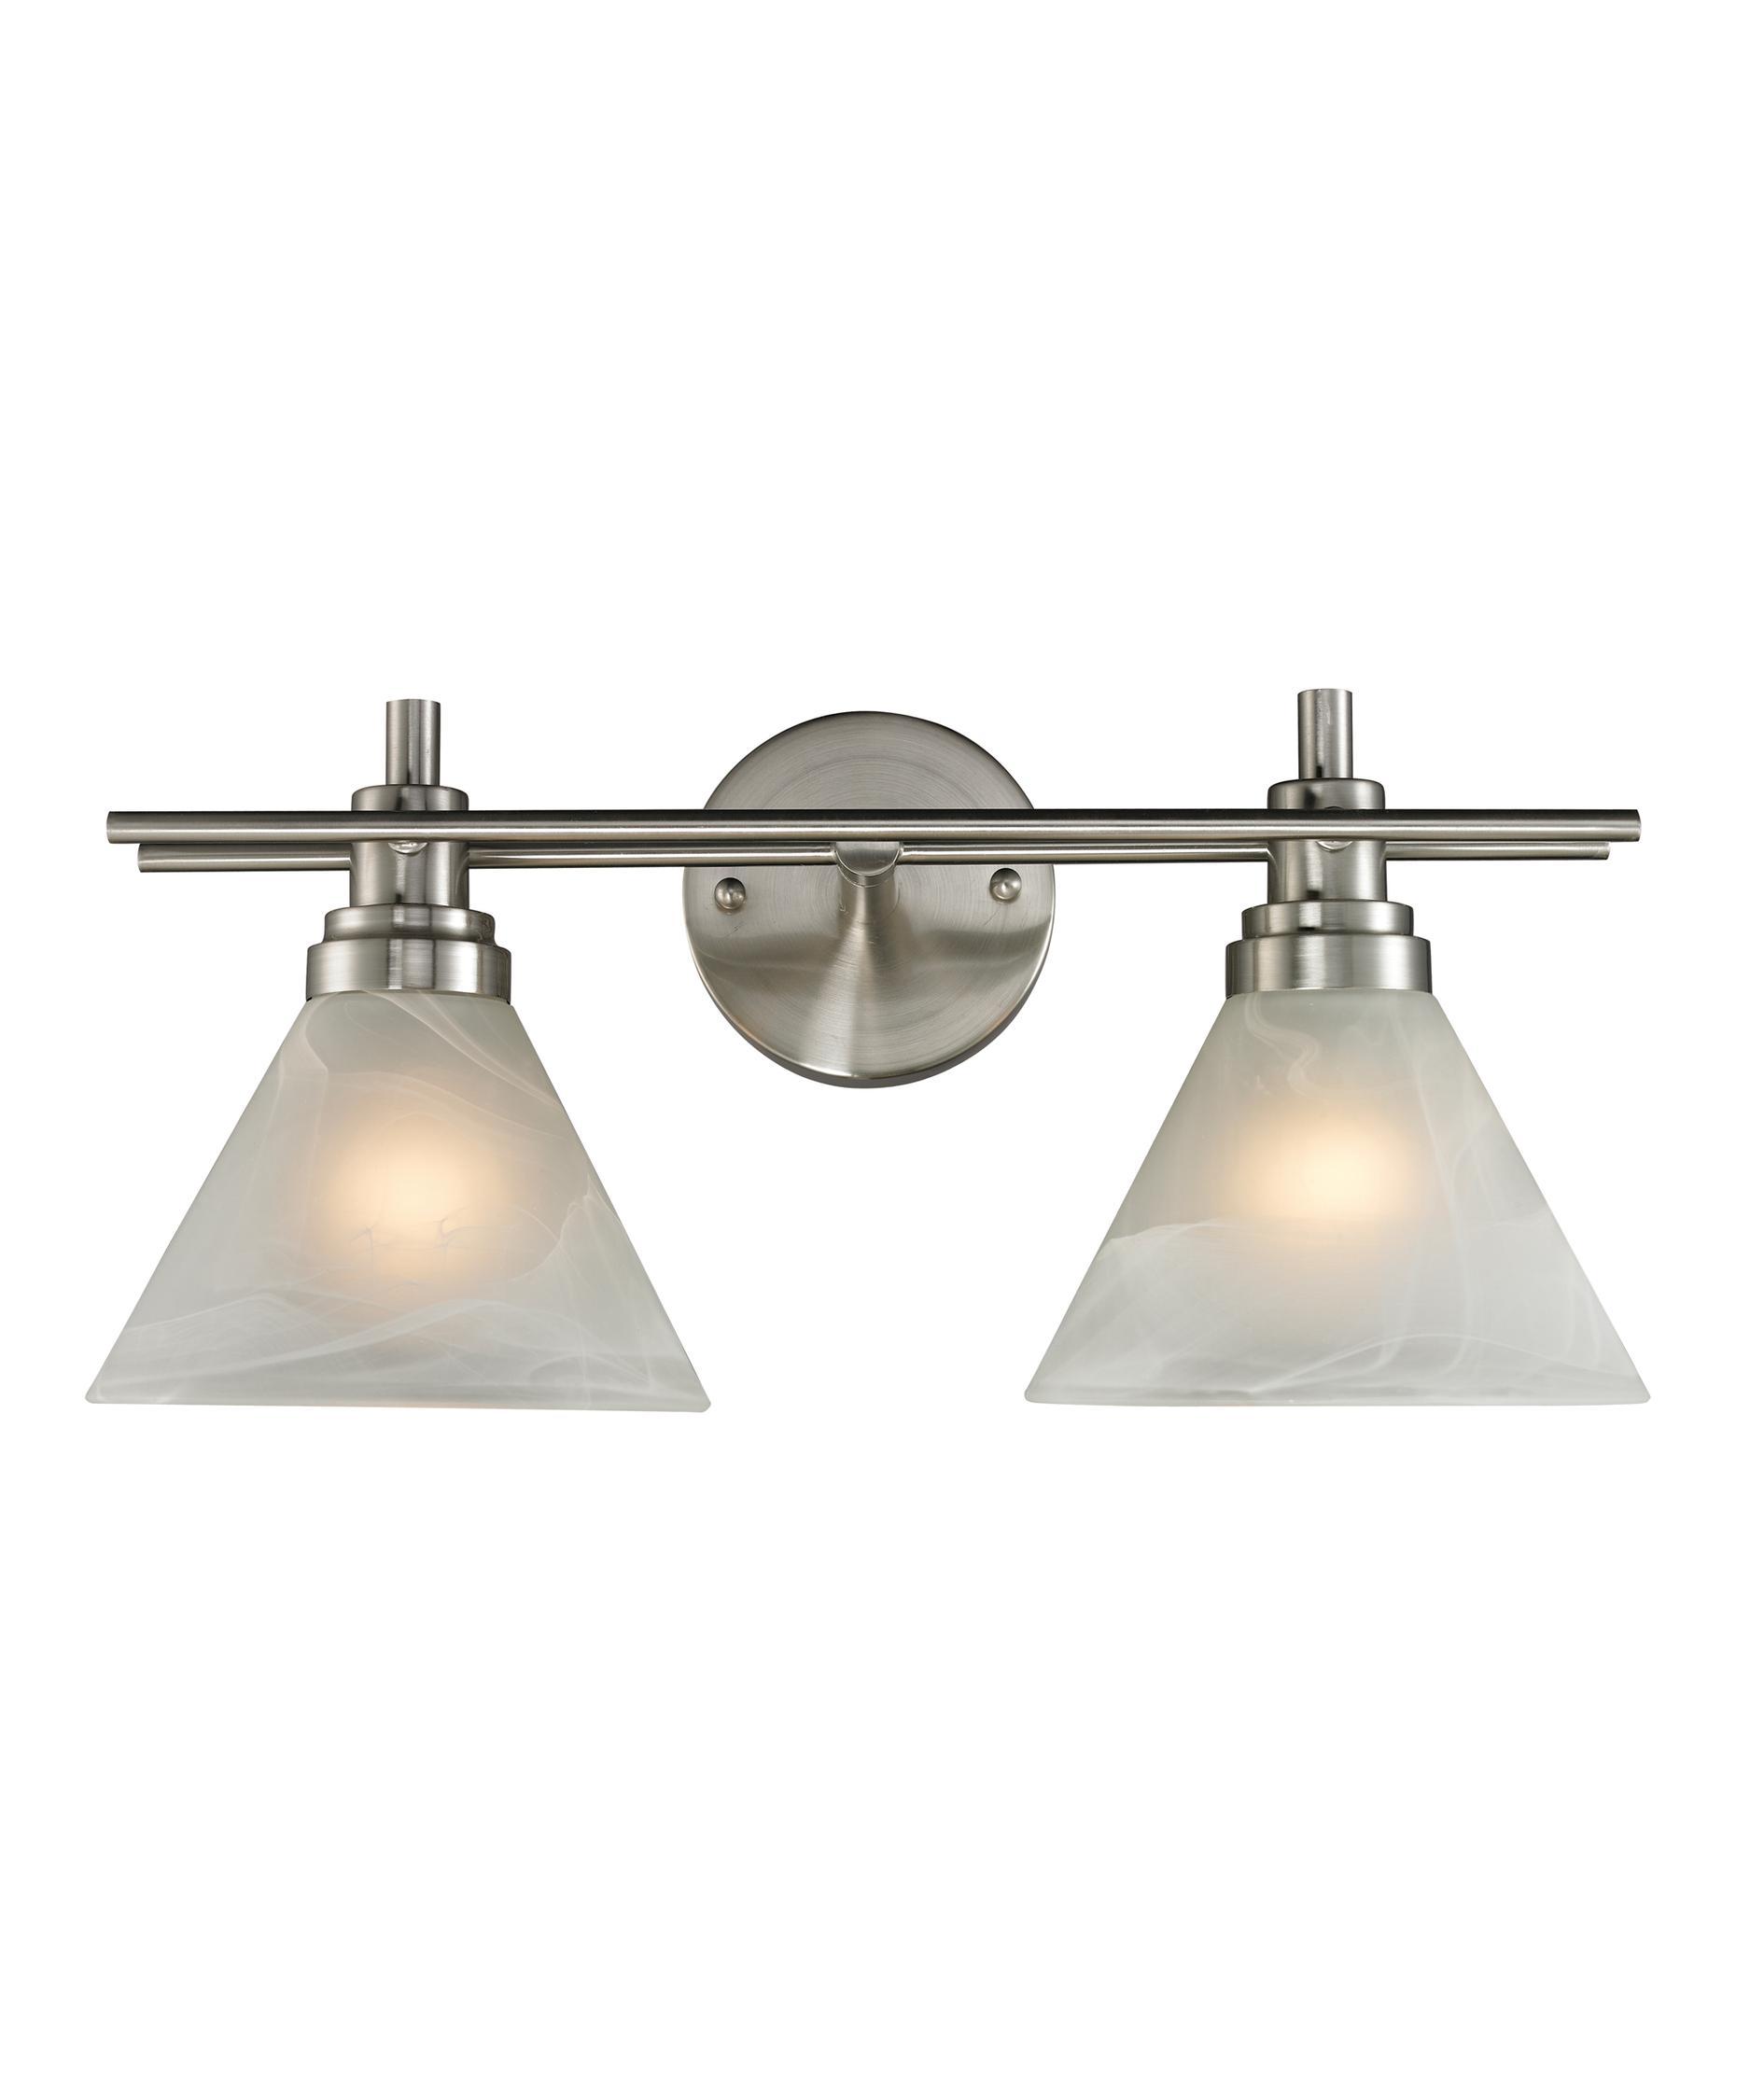 Bathroom Vanity Lights For Sale elk lighting 11401-2 pemberton 18 inch wide bath vanity light